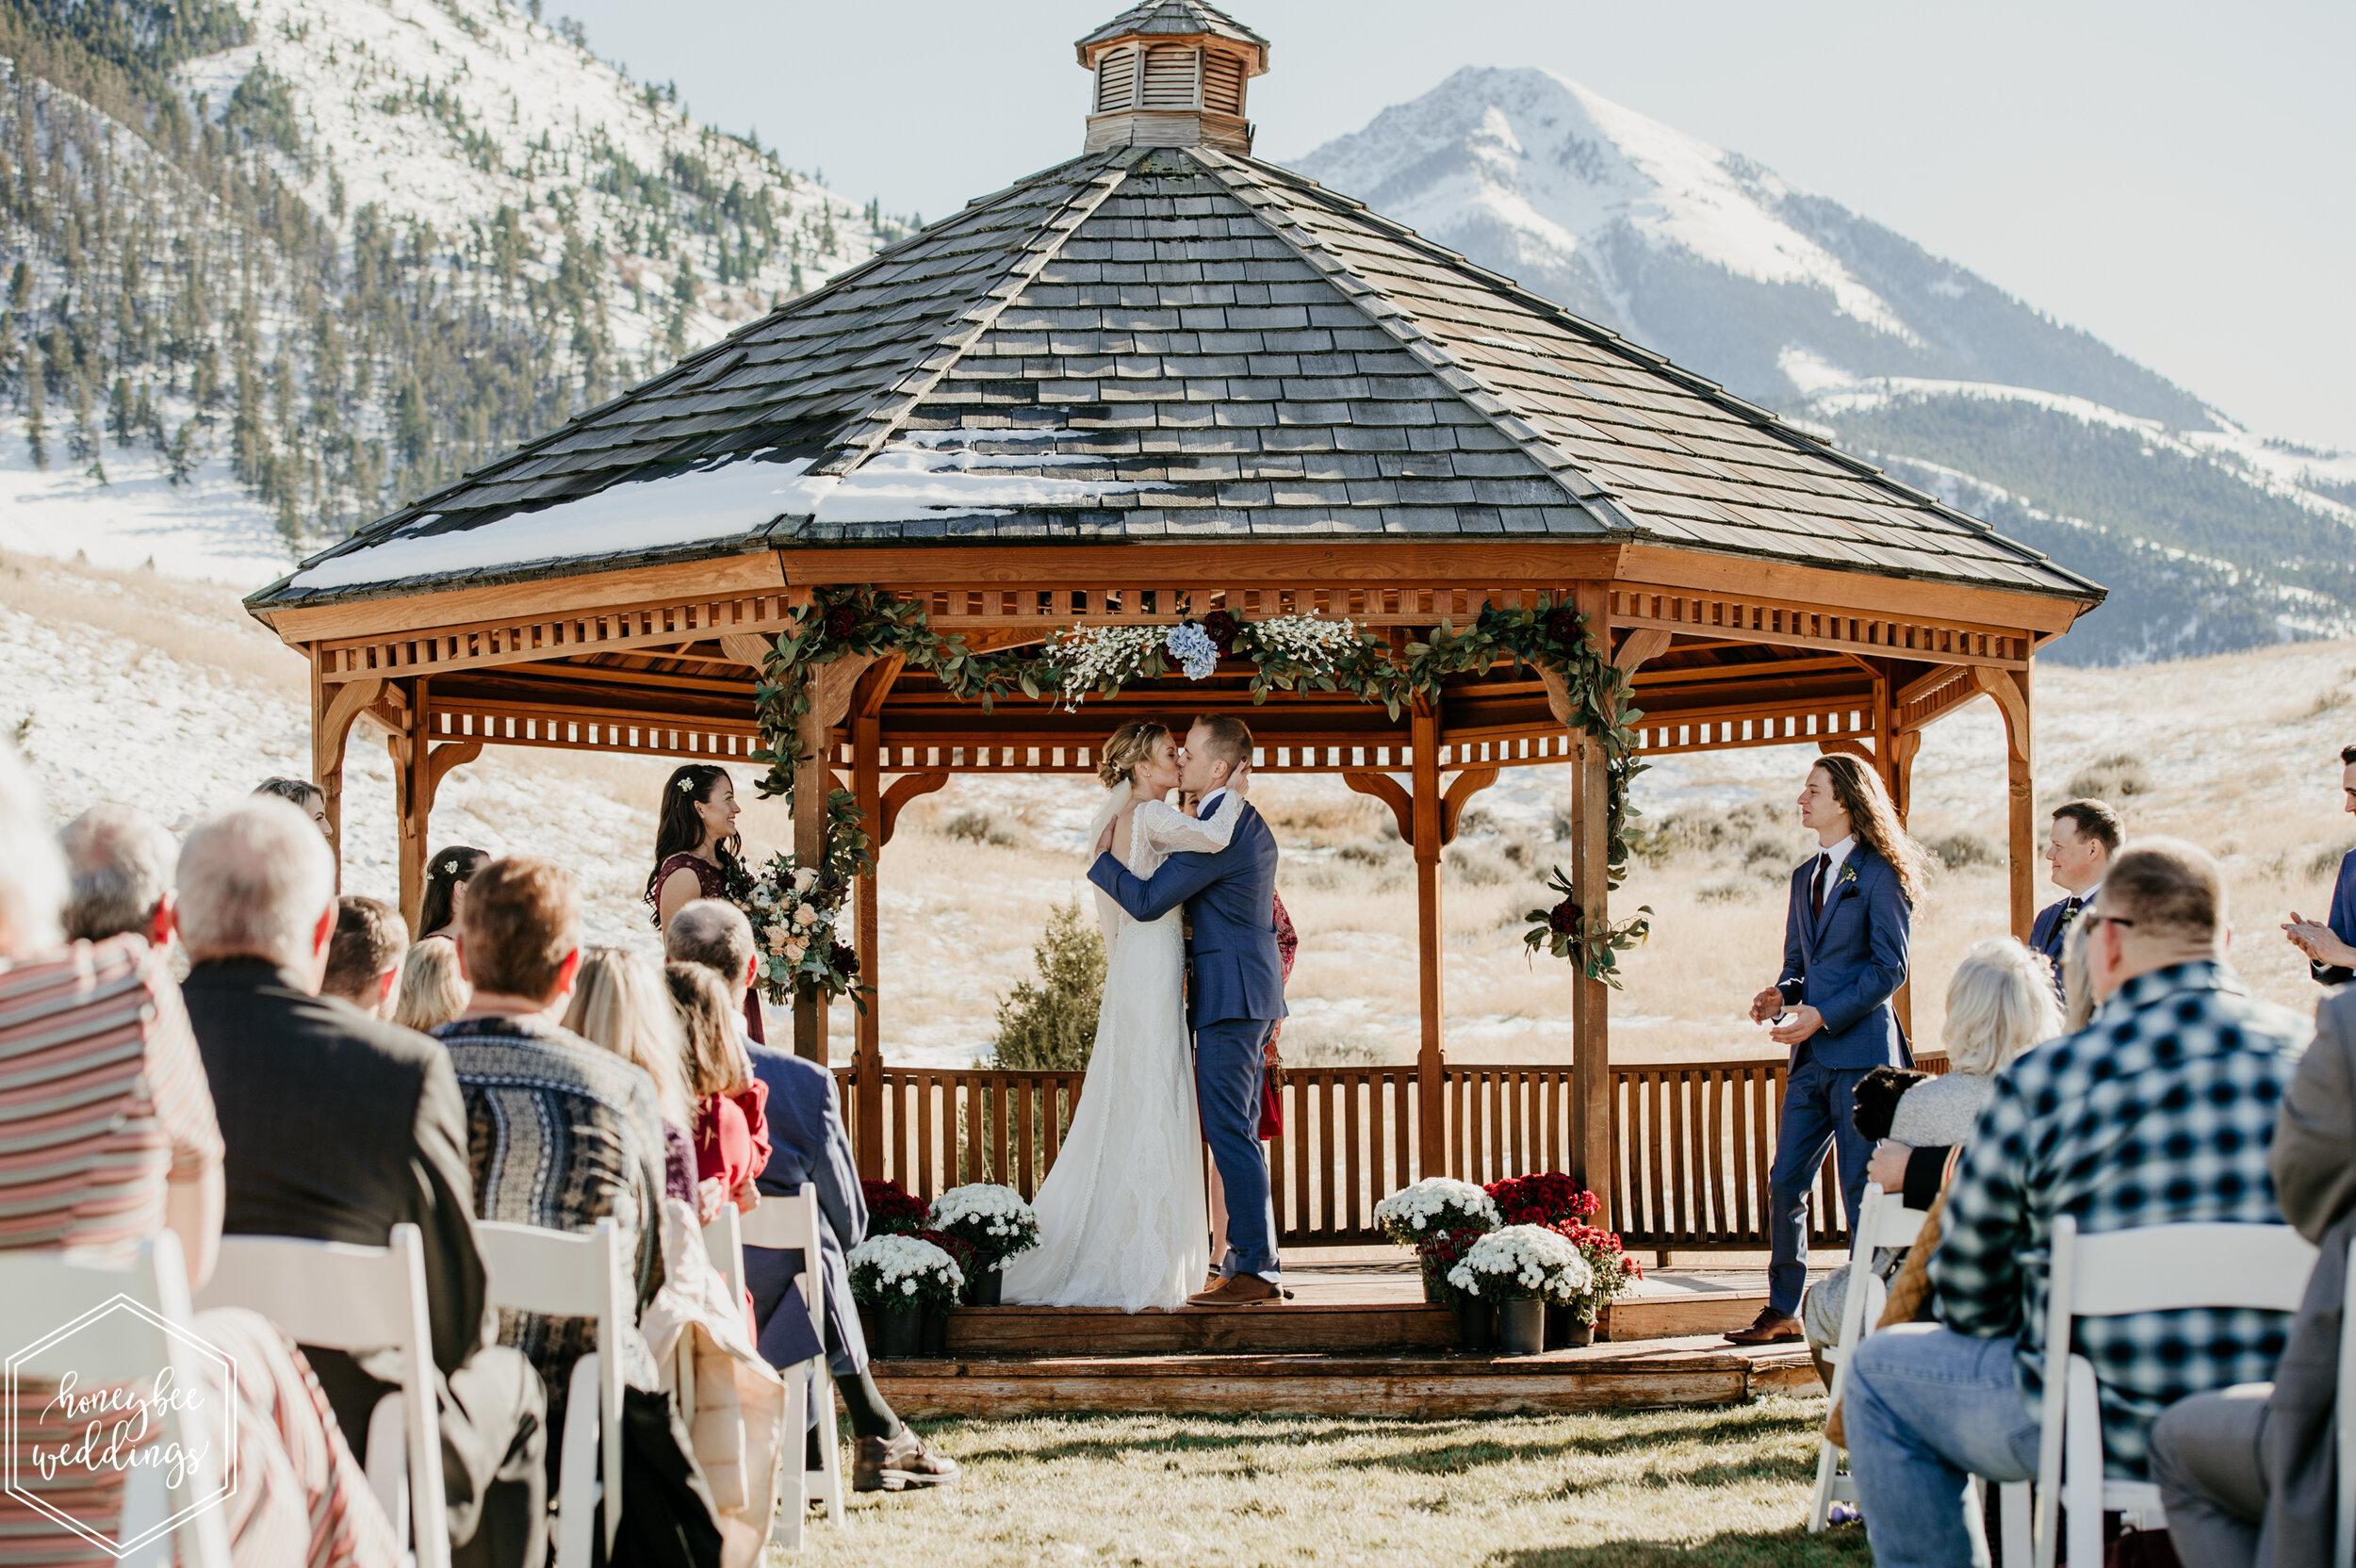 134Chico Hot Springs Wedding_Montana Wedding Photographer_Winter Wedding_Ariel & Richard_October 12, 2019-2323.jpg